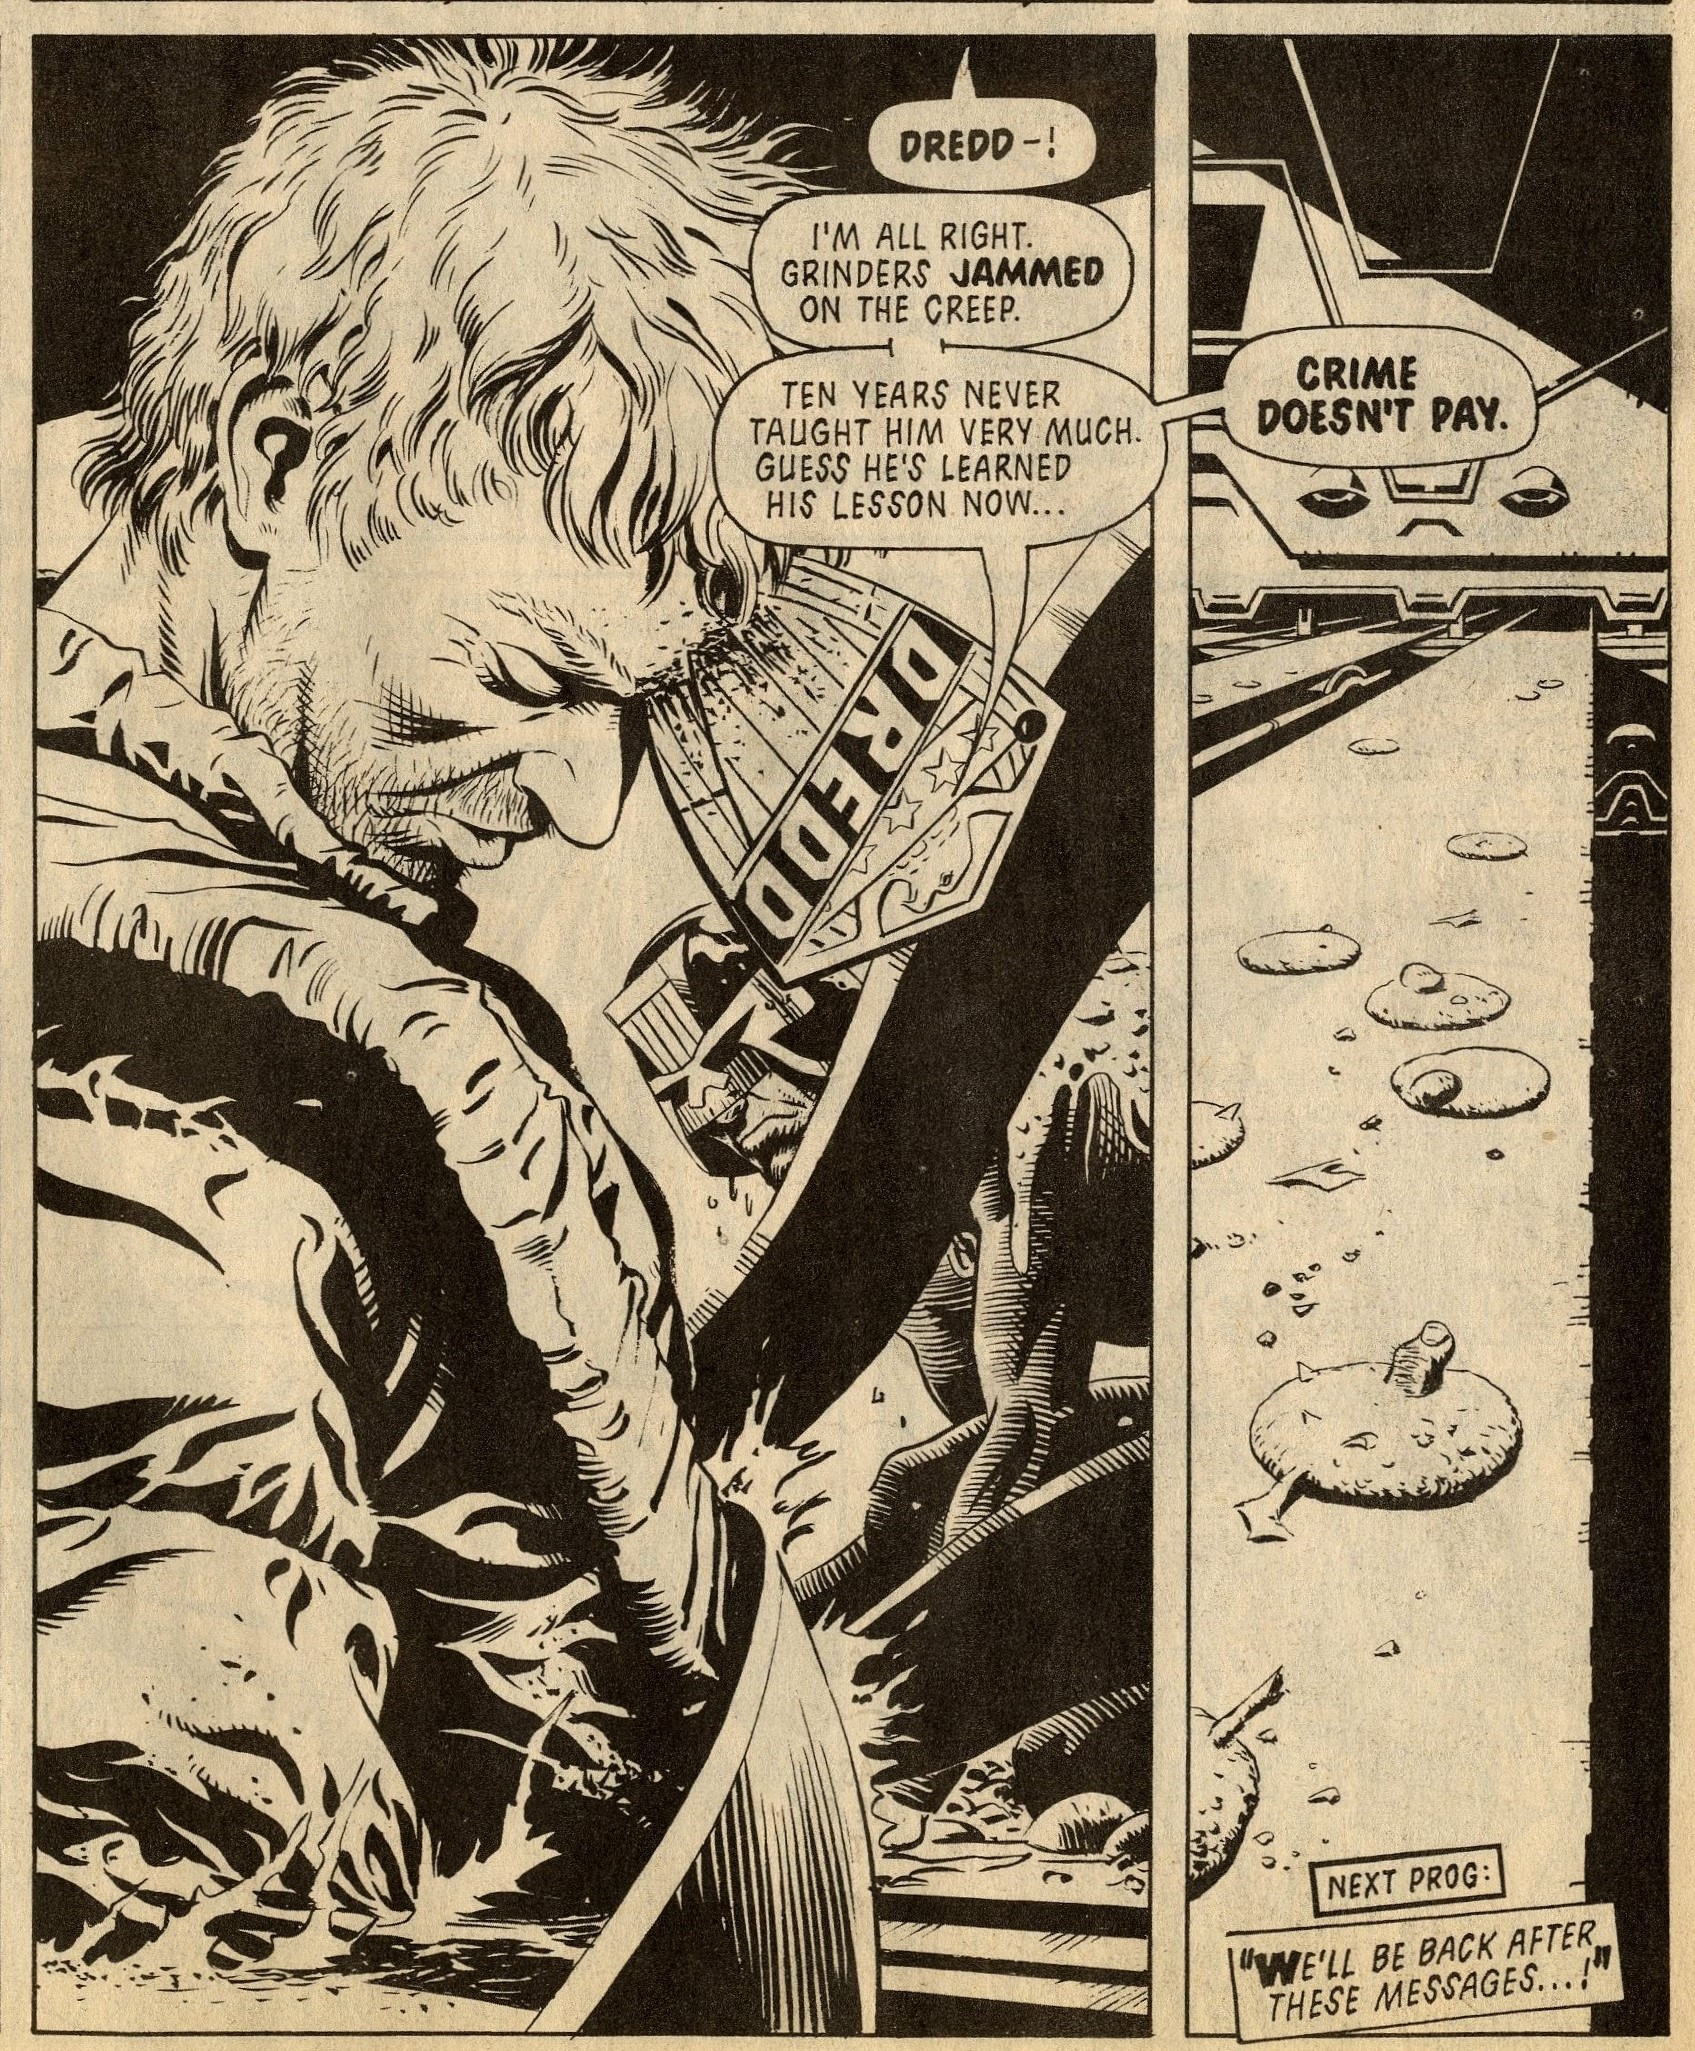 Judge Dredd: John Wagner and Alan Grant (writer), Garry Leach (artist)